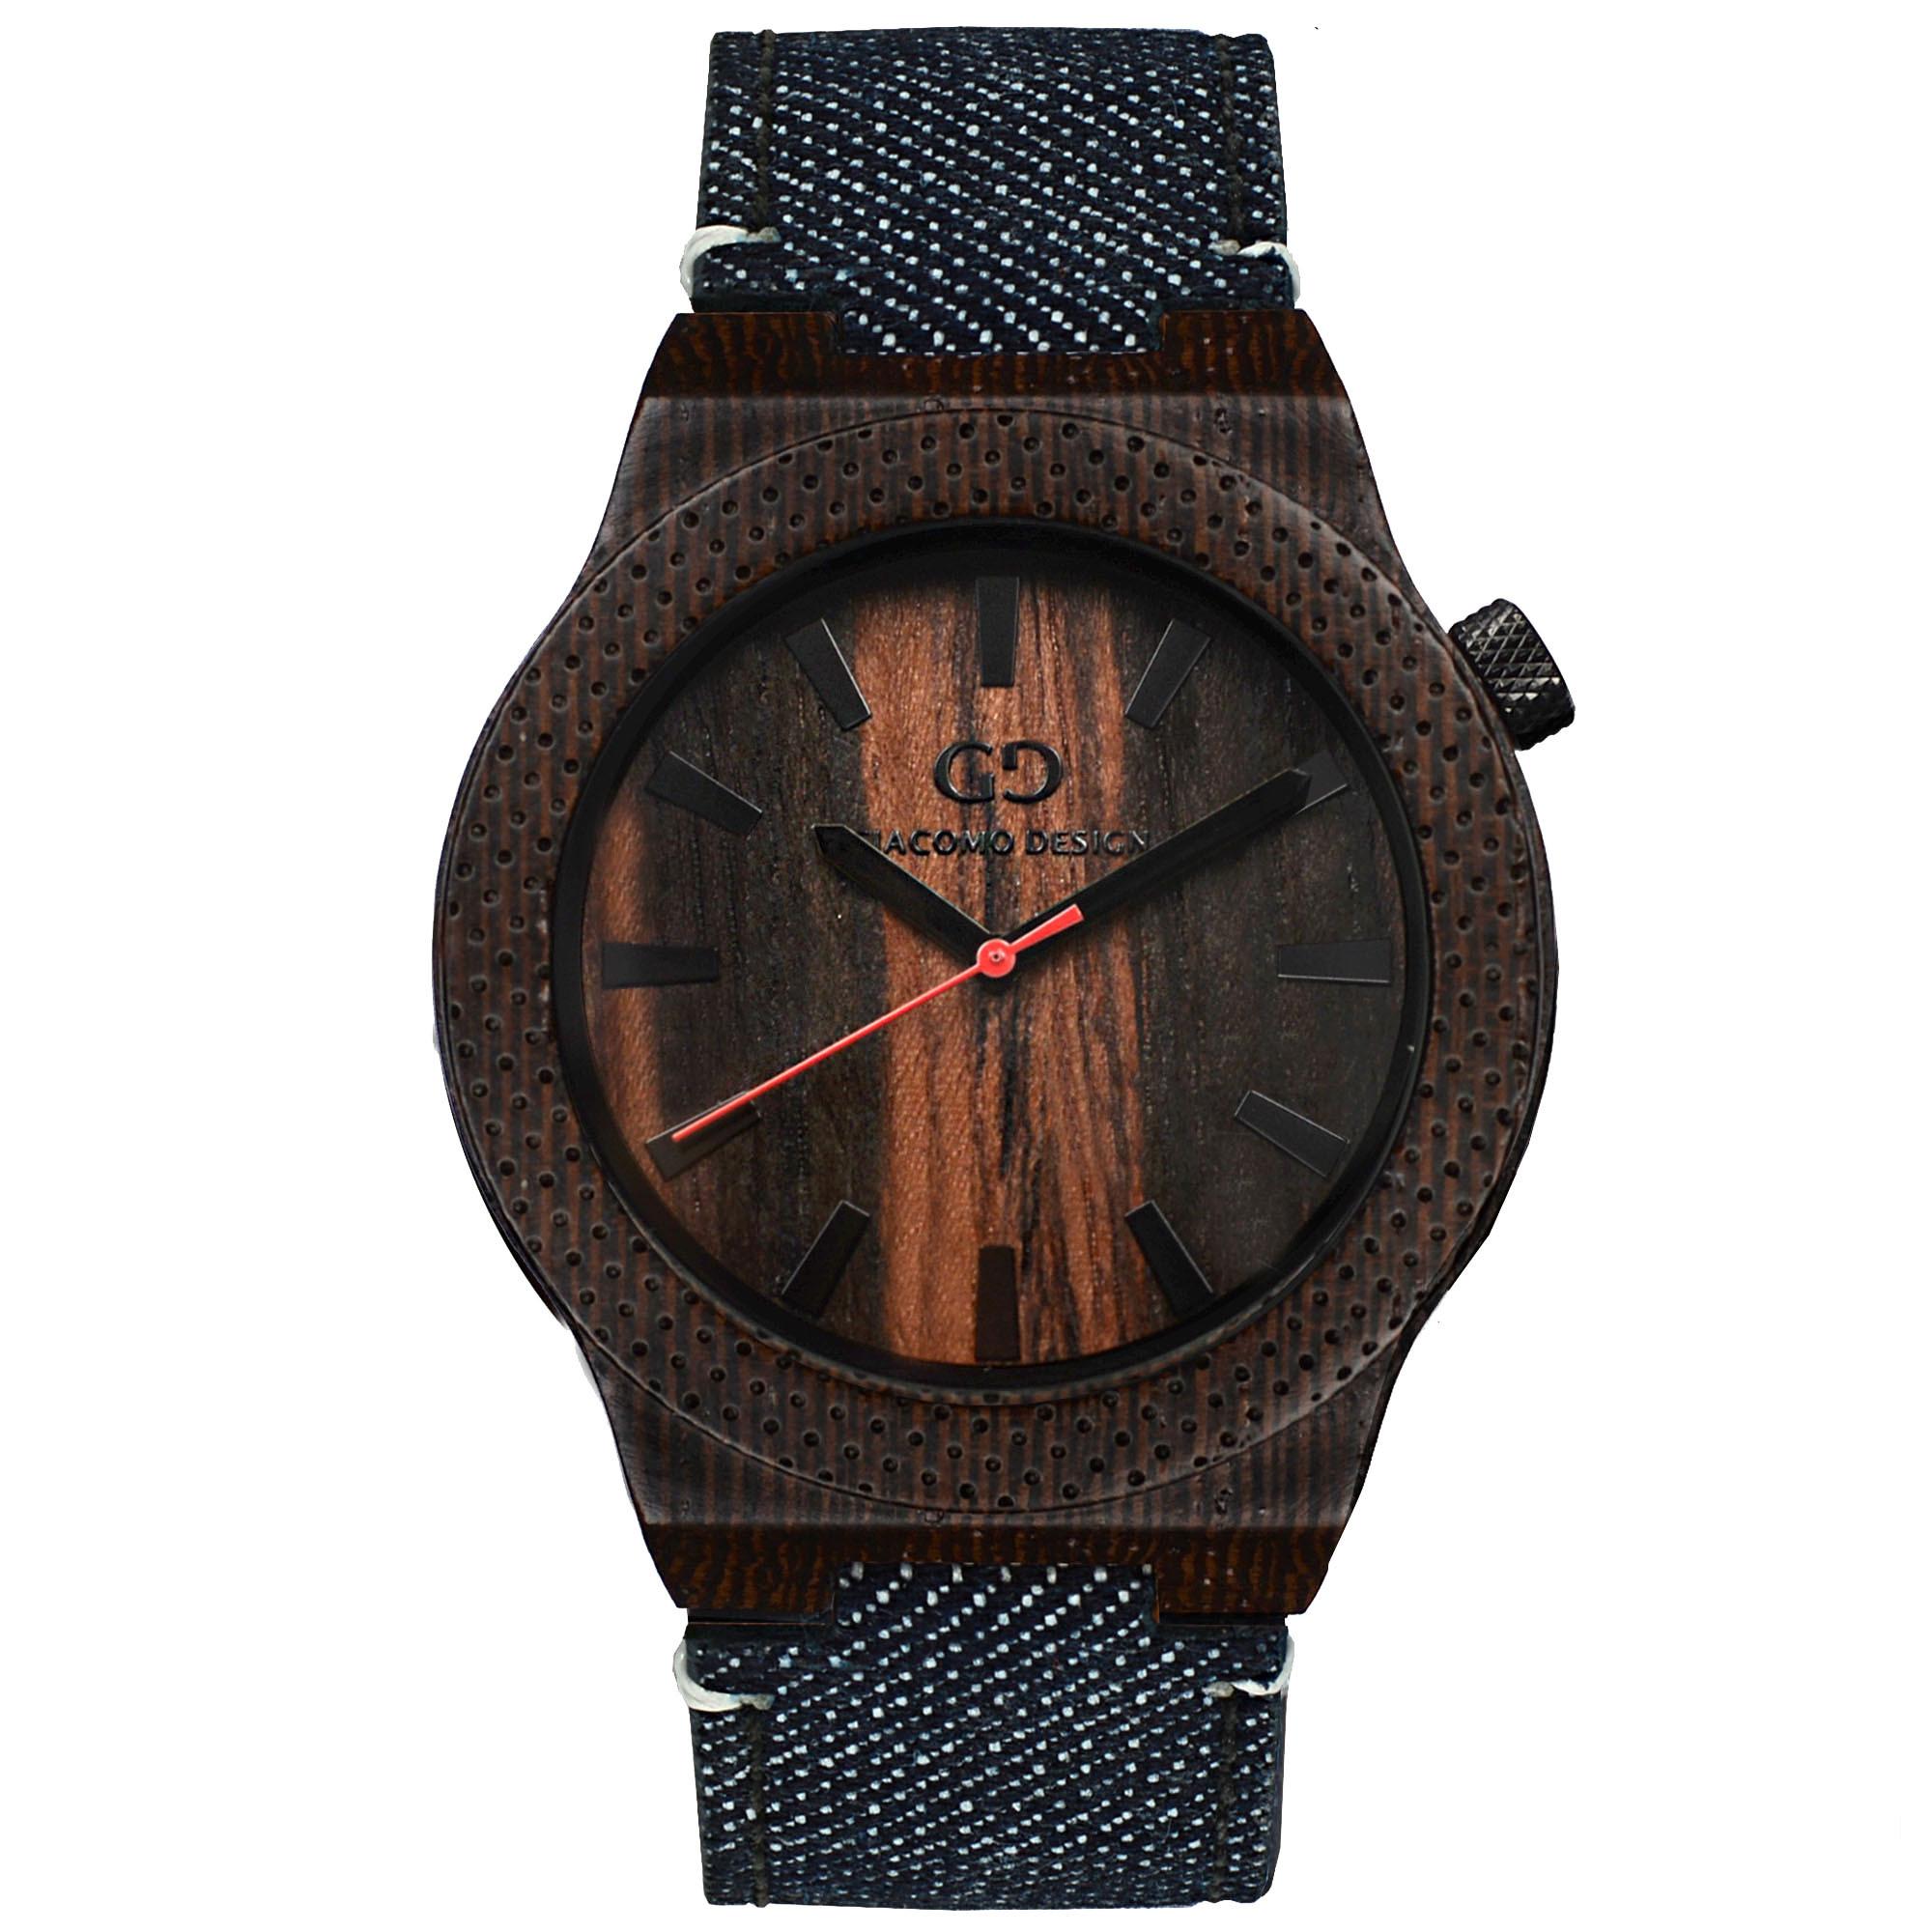 69d3941c11b92b Męski zegarek Giacomo Design Orologio Massiccio drewno wenga ...